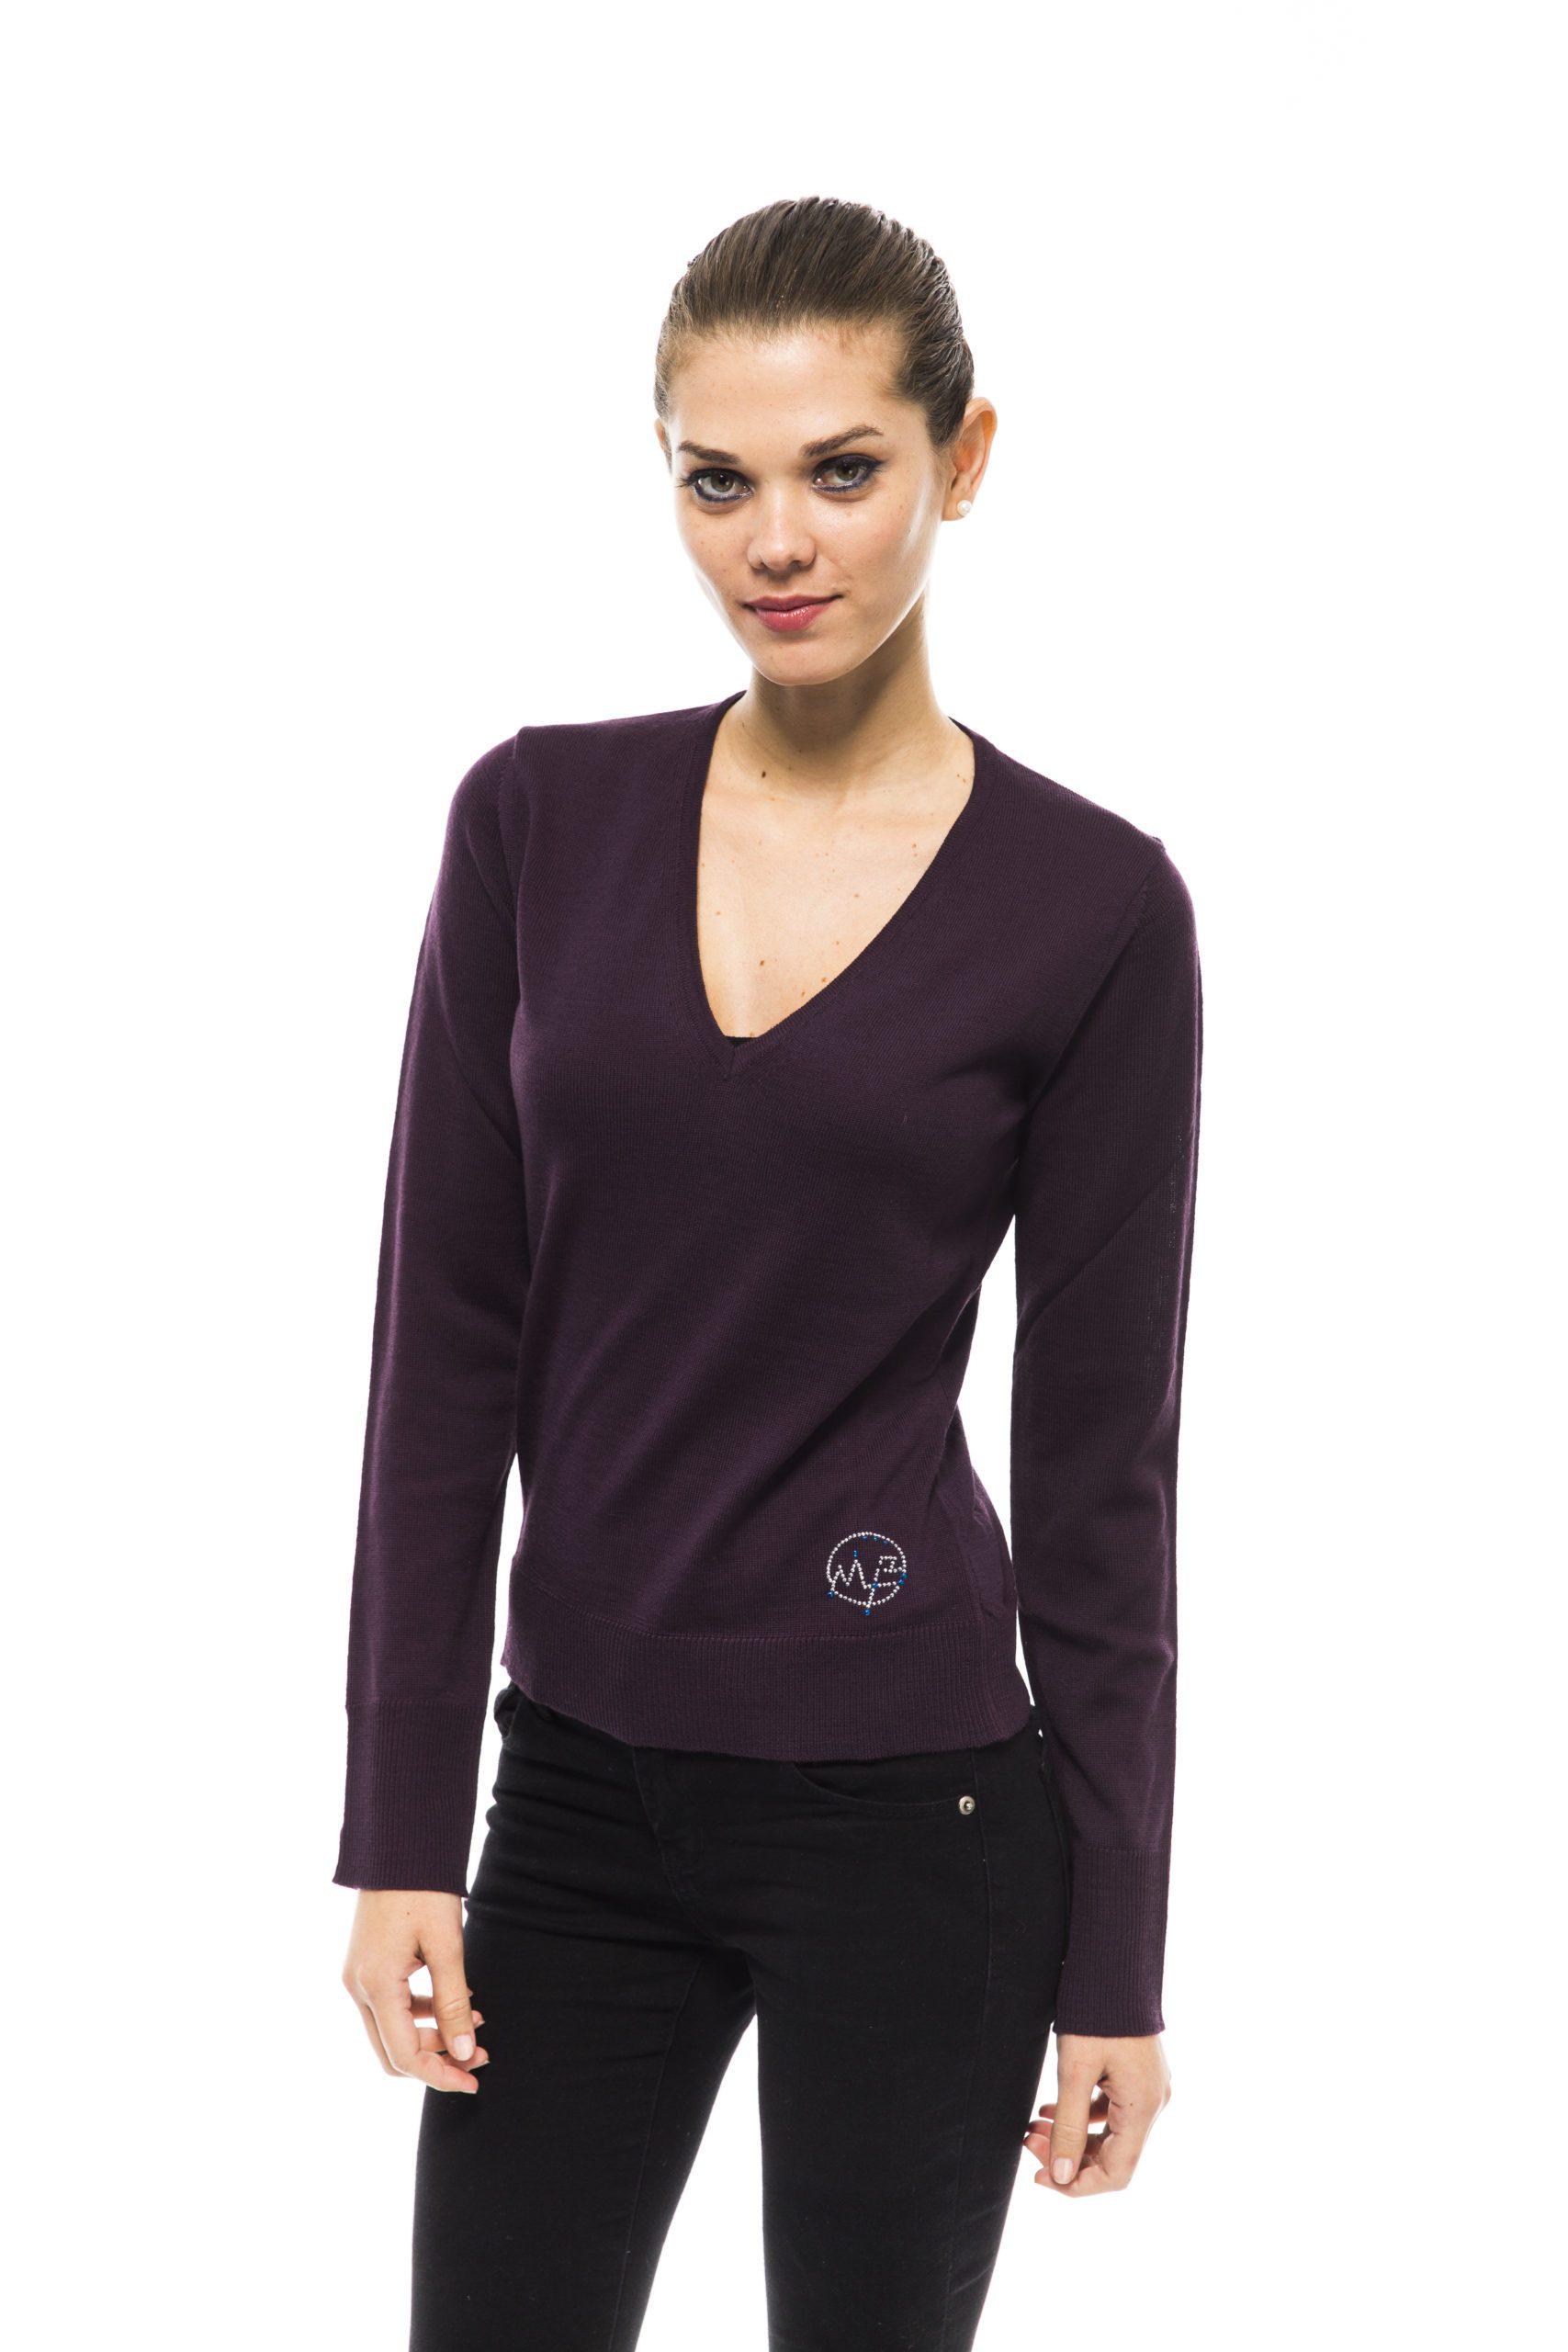 Montana Blu Women's Prugna Sweater Violet MO1191427 - IT40 | XS